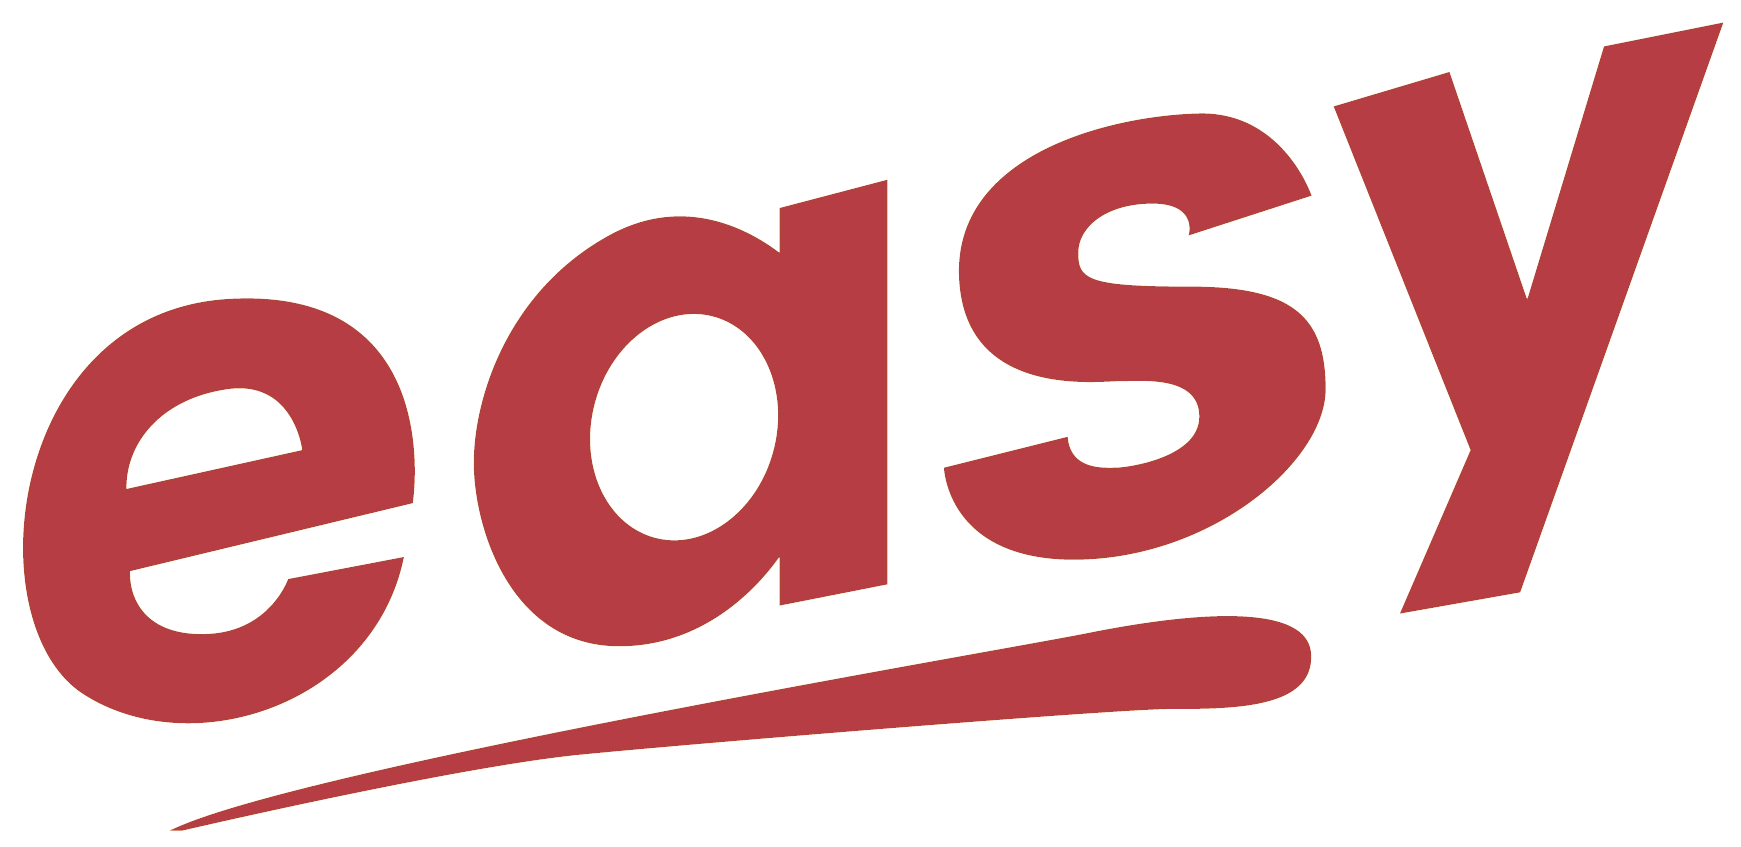 easy logopedia fandom powered